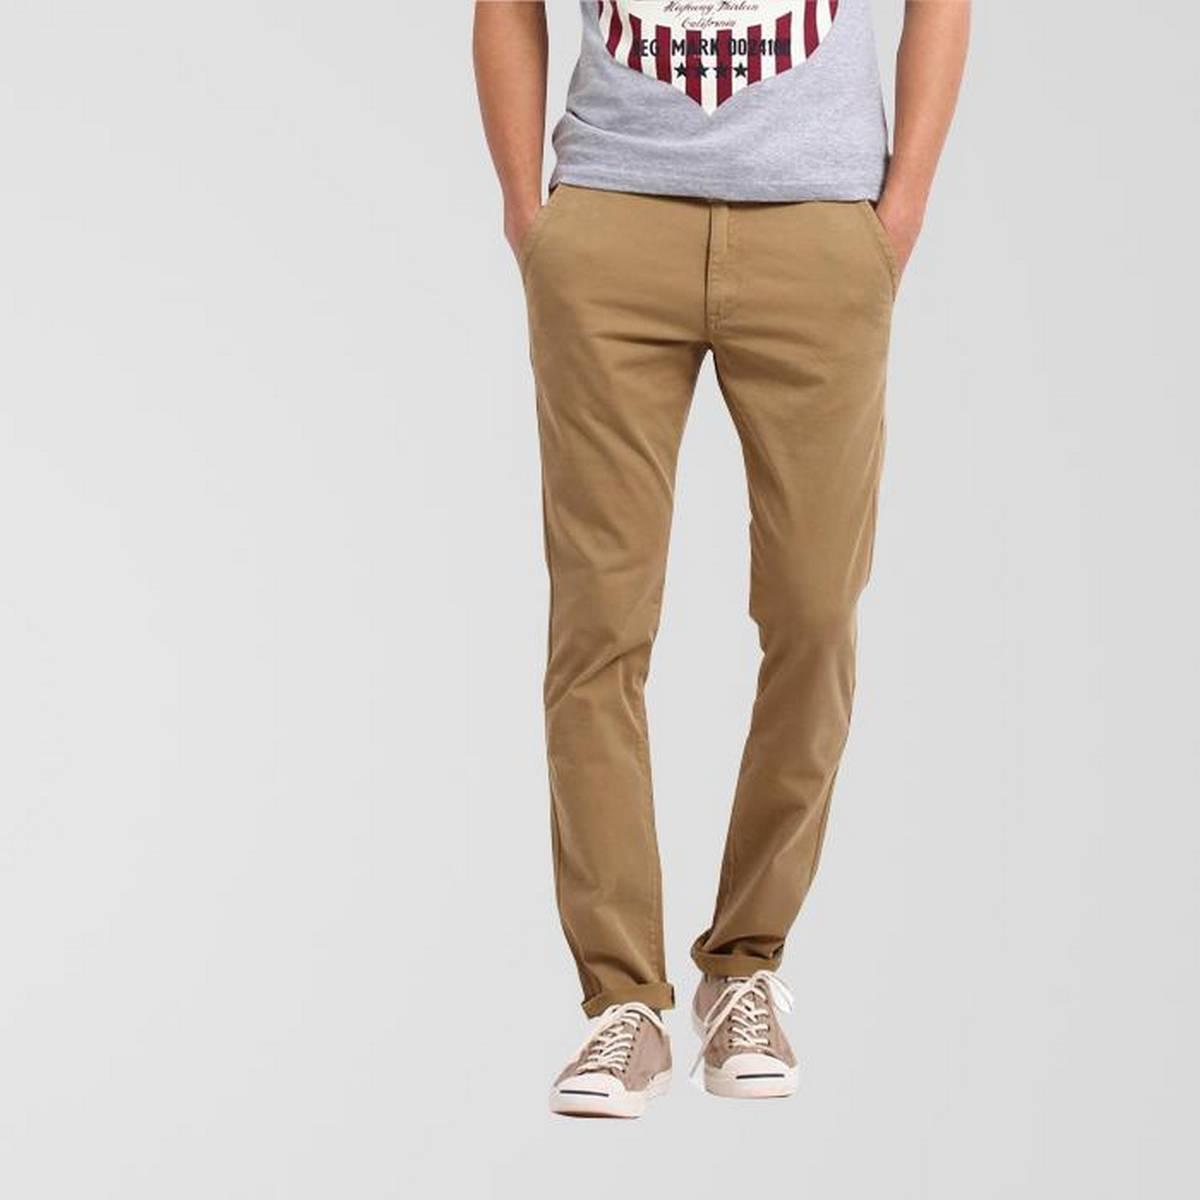 Khaki Color Stretchable Slim Fit Cotton Chinos